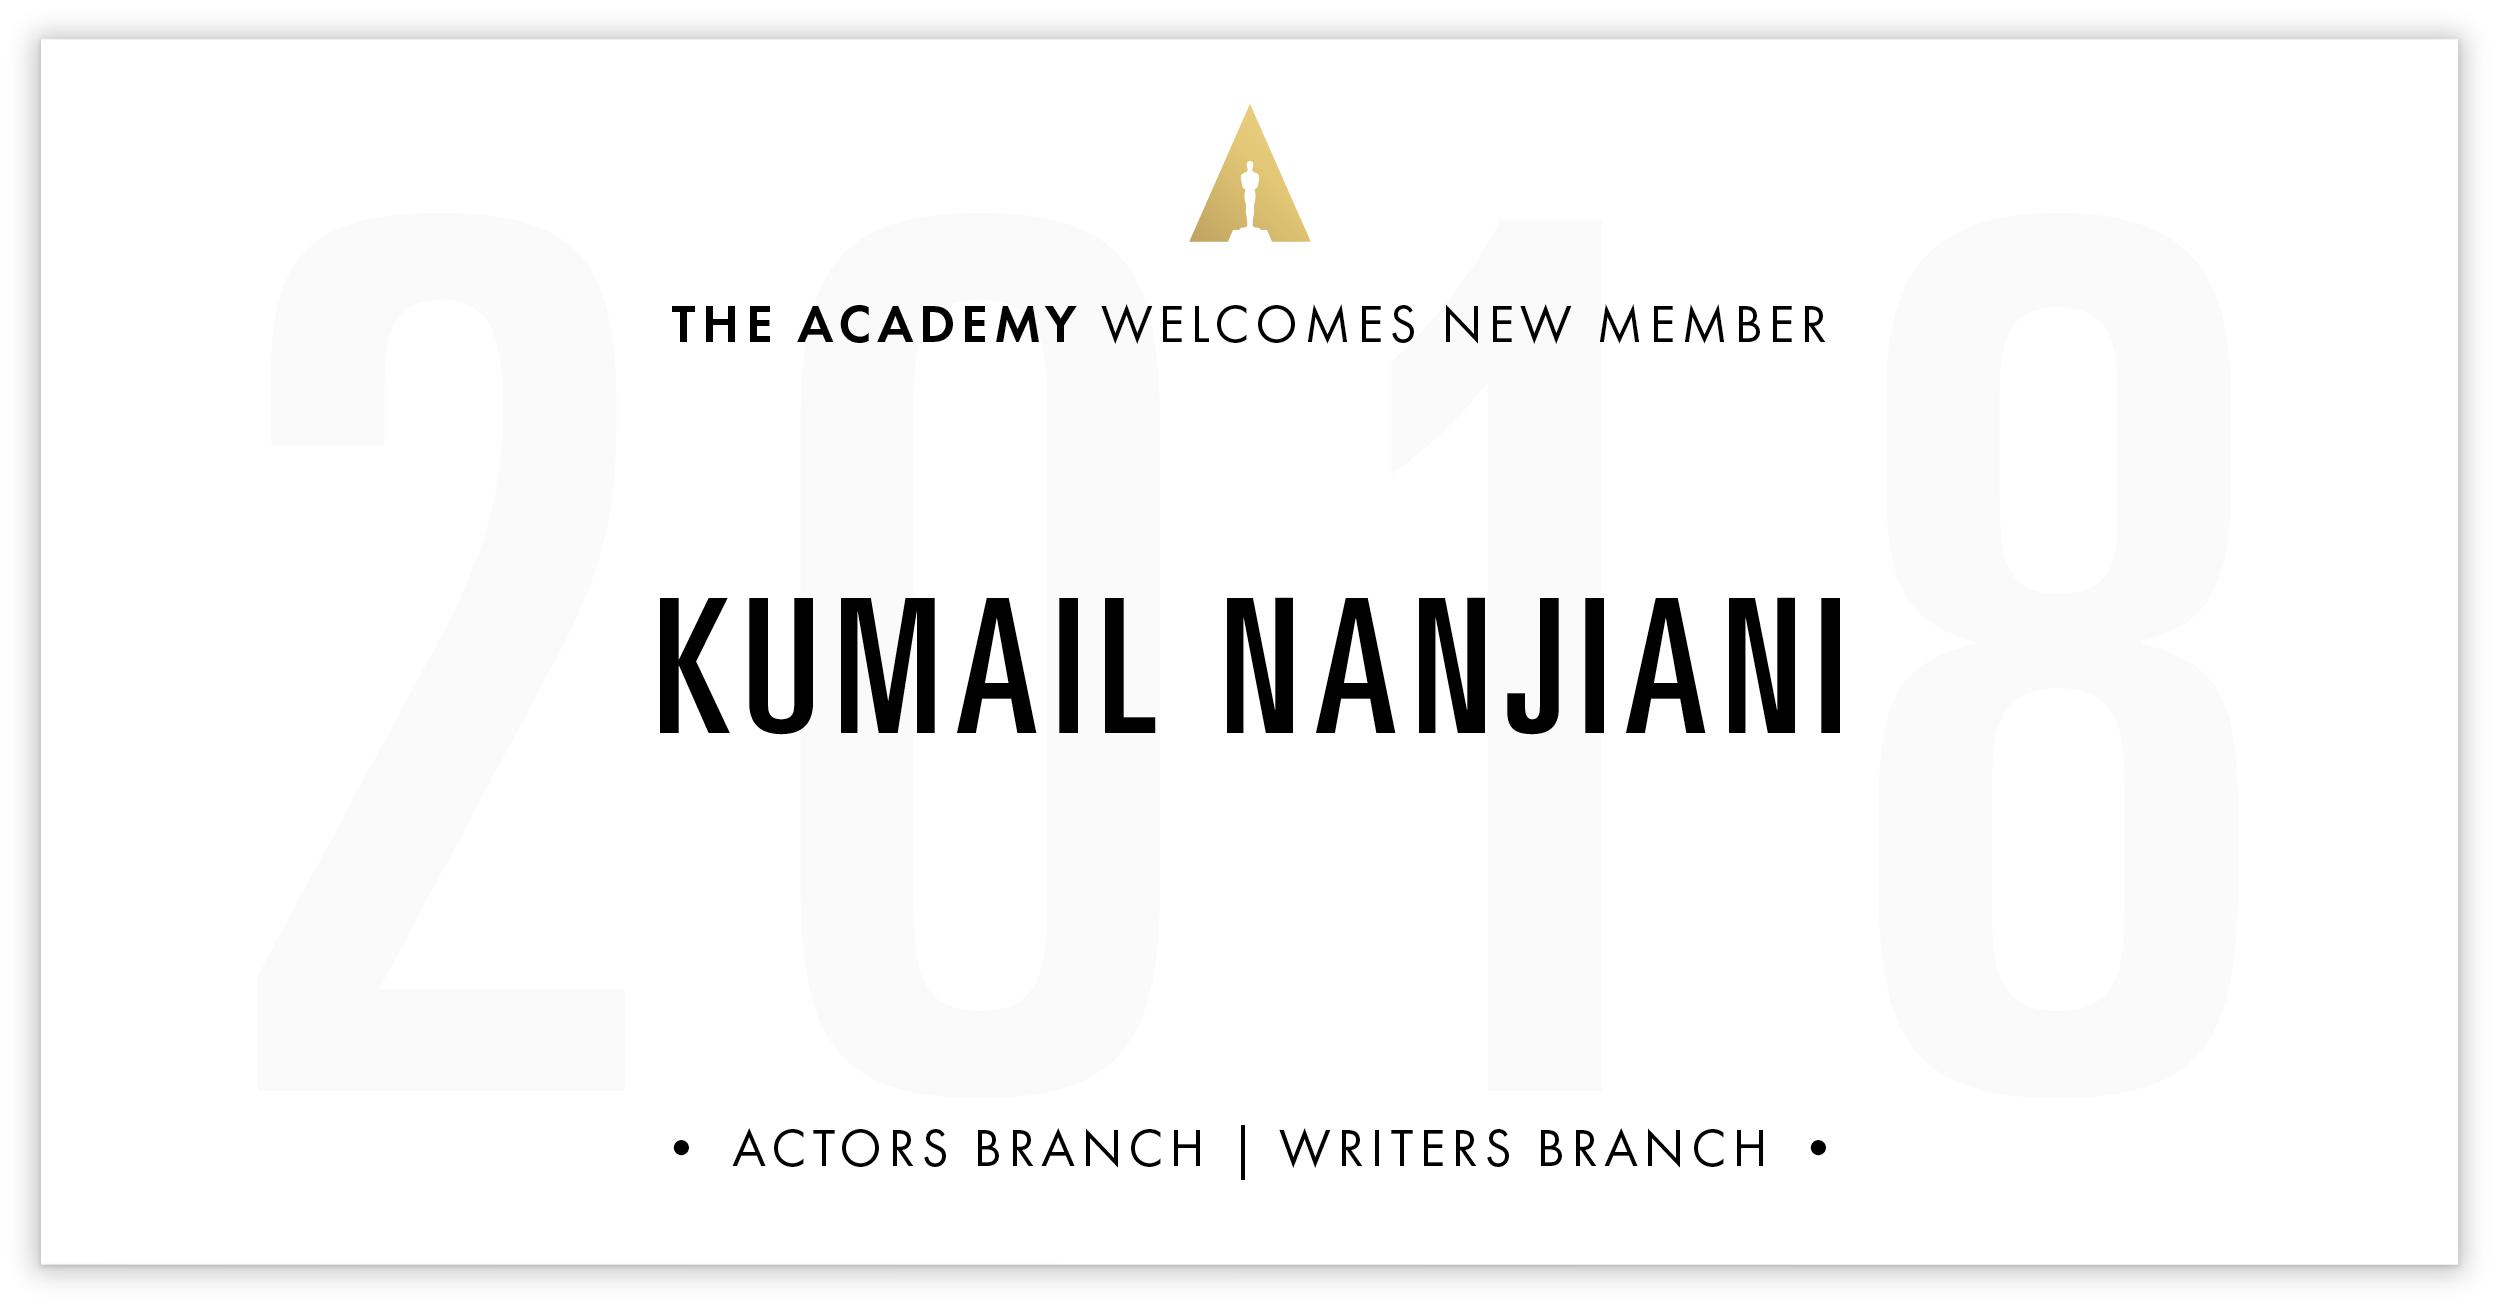 Kumail Nanjiani is invited!